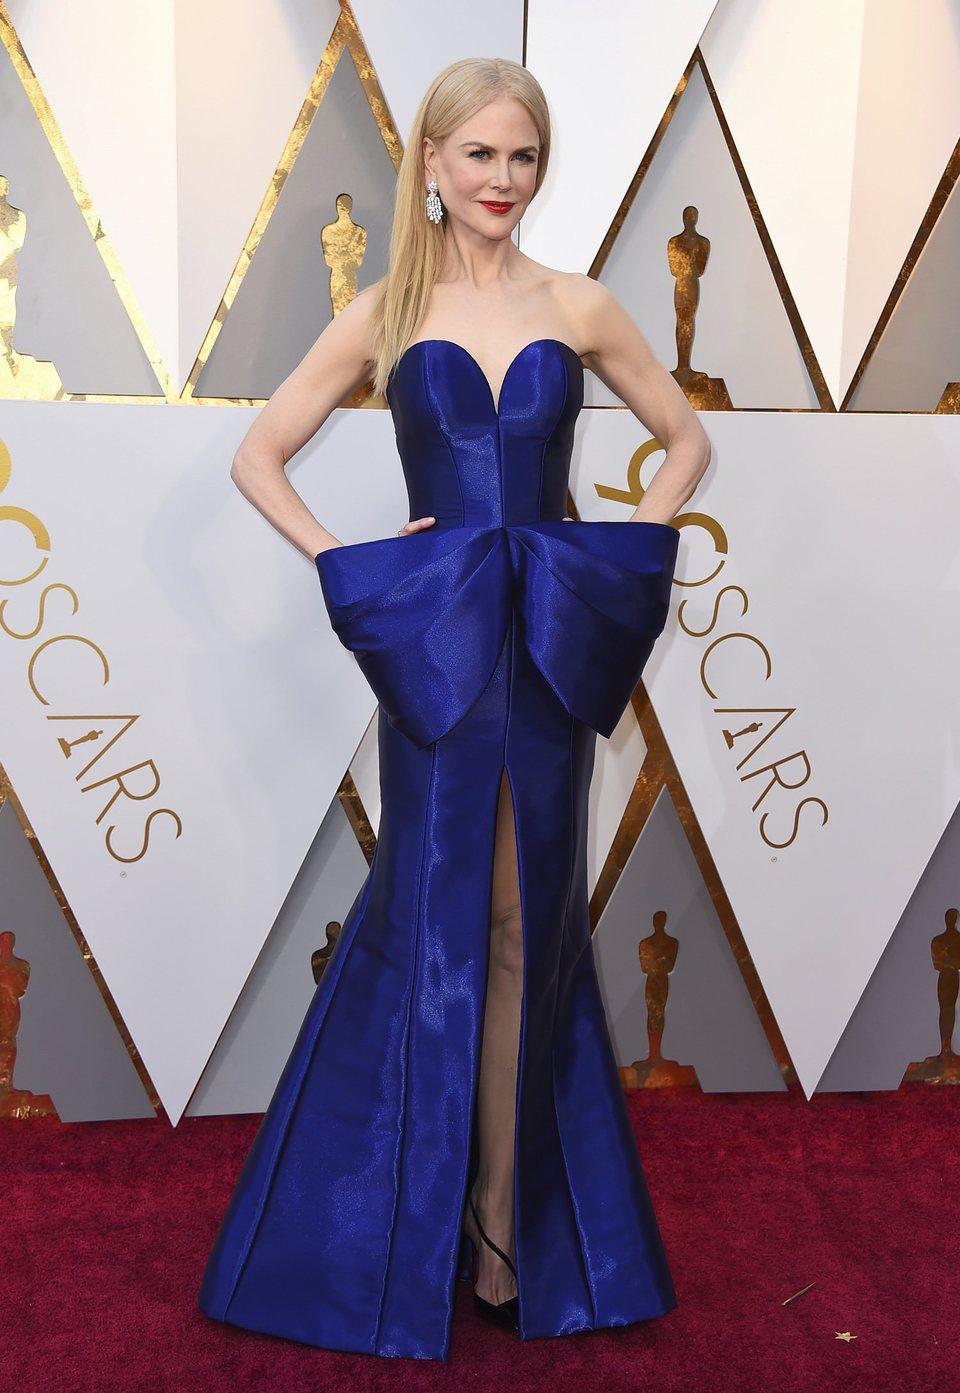 Nicole Kidman at the Oscar 2018 red carpet